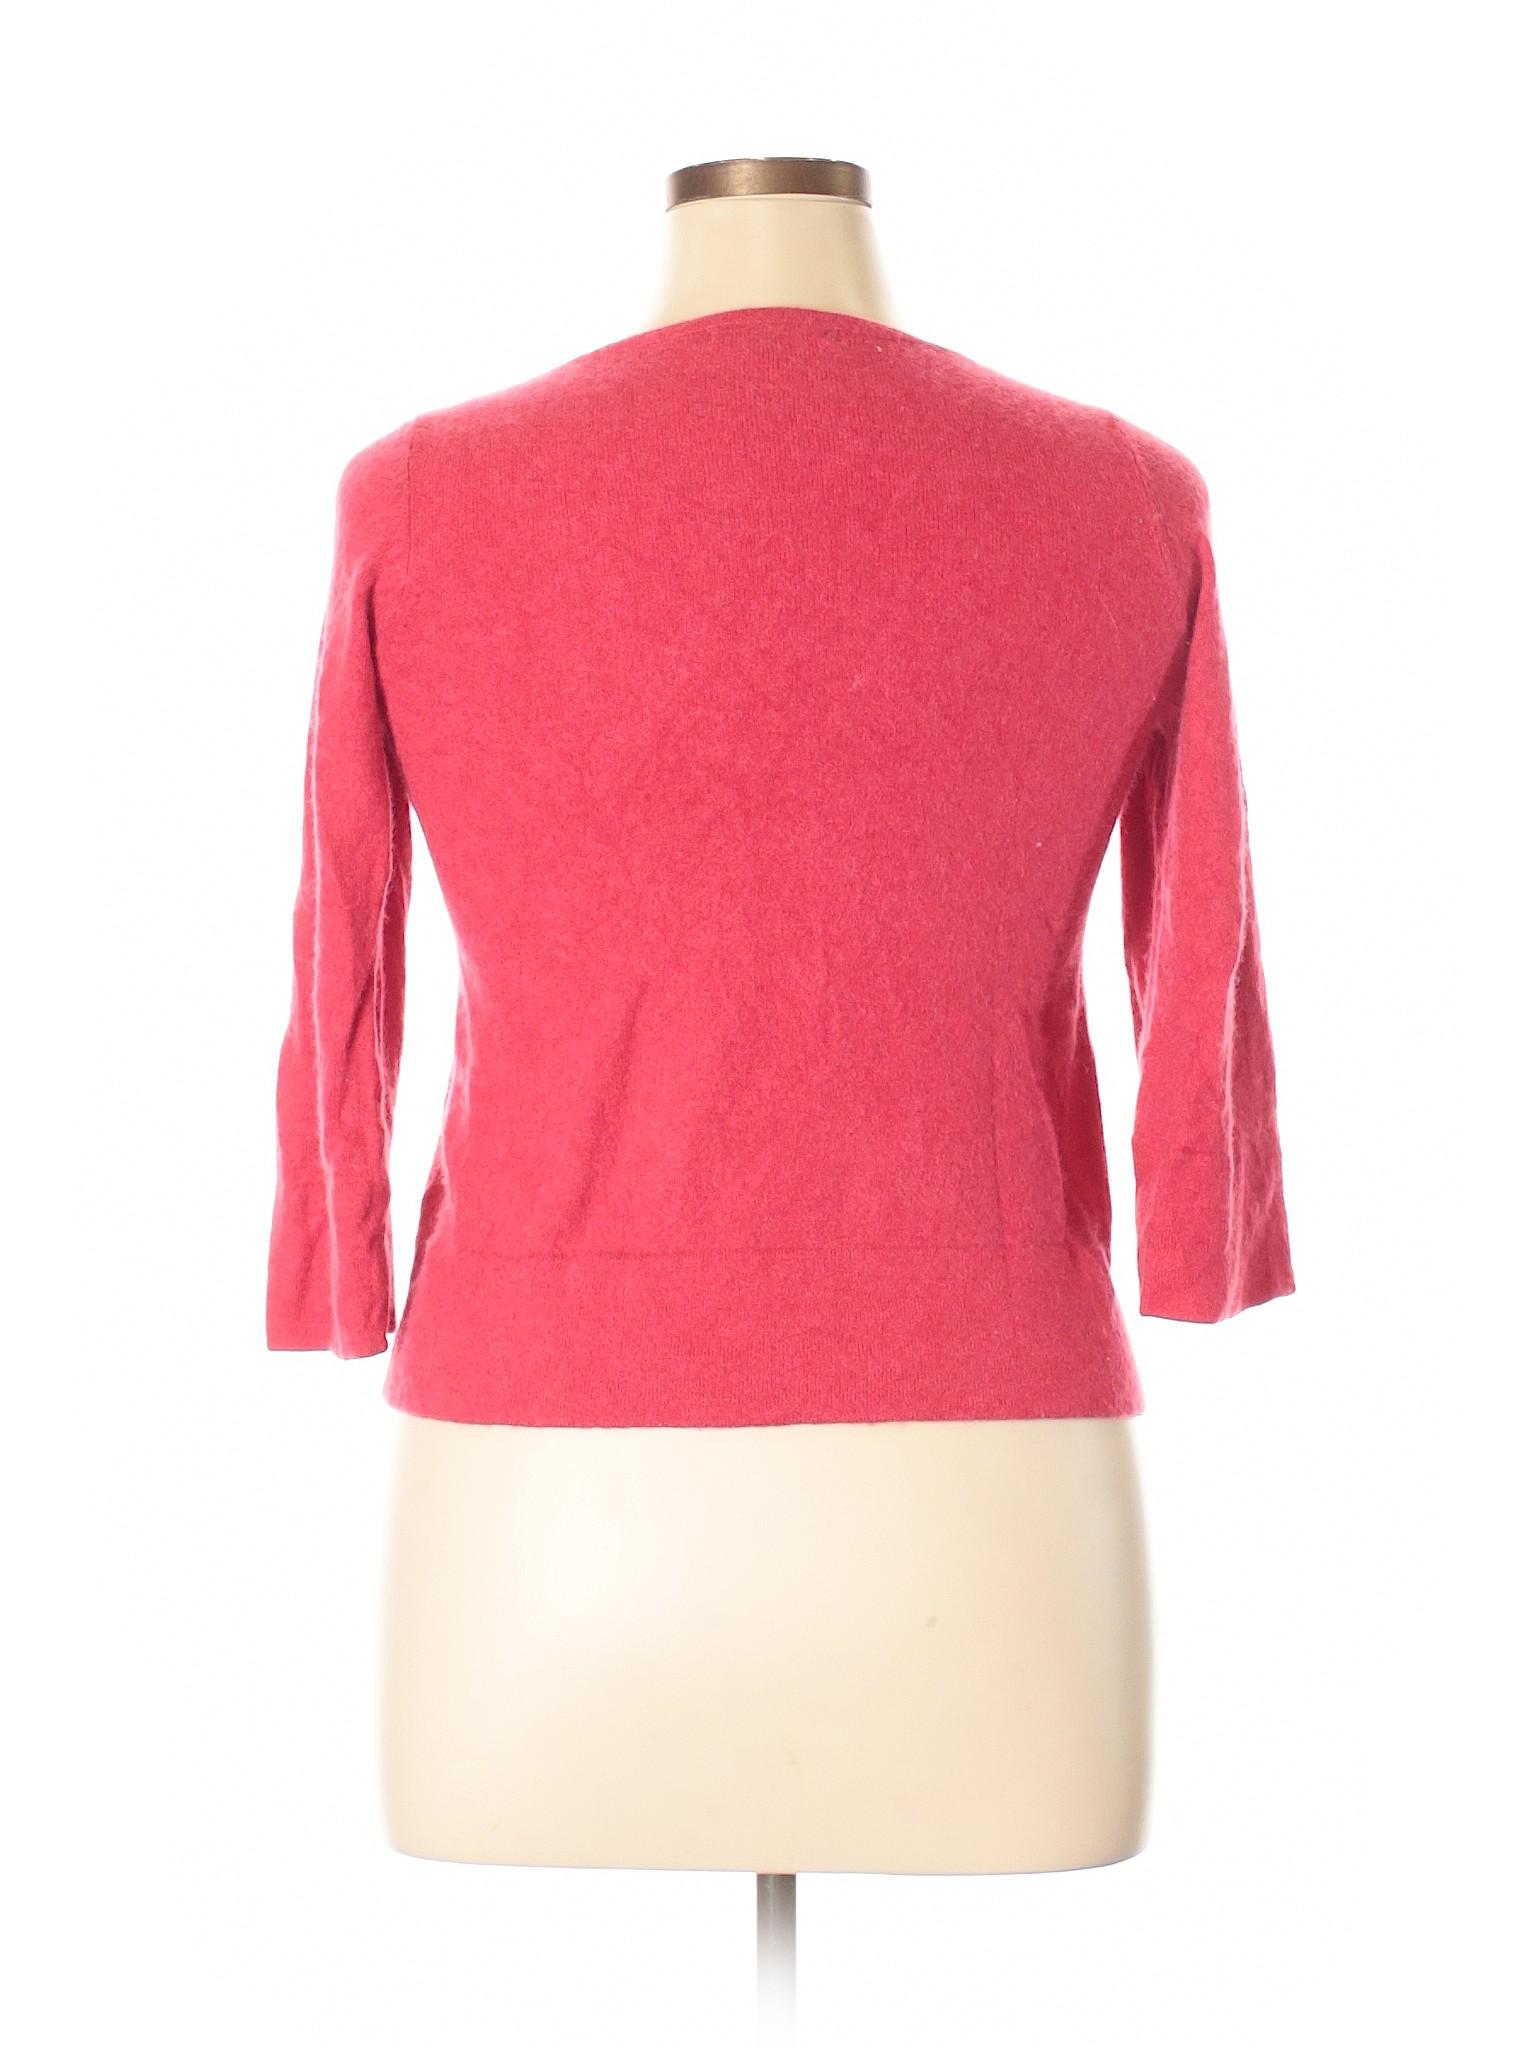 Boutique Sweater Cashmere Boden Pullover Boutique Boden YrwxaqRr